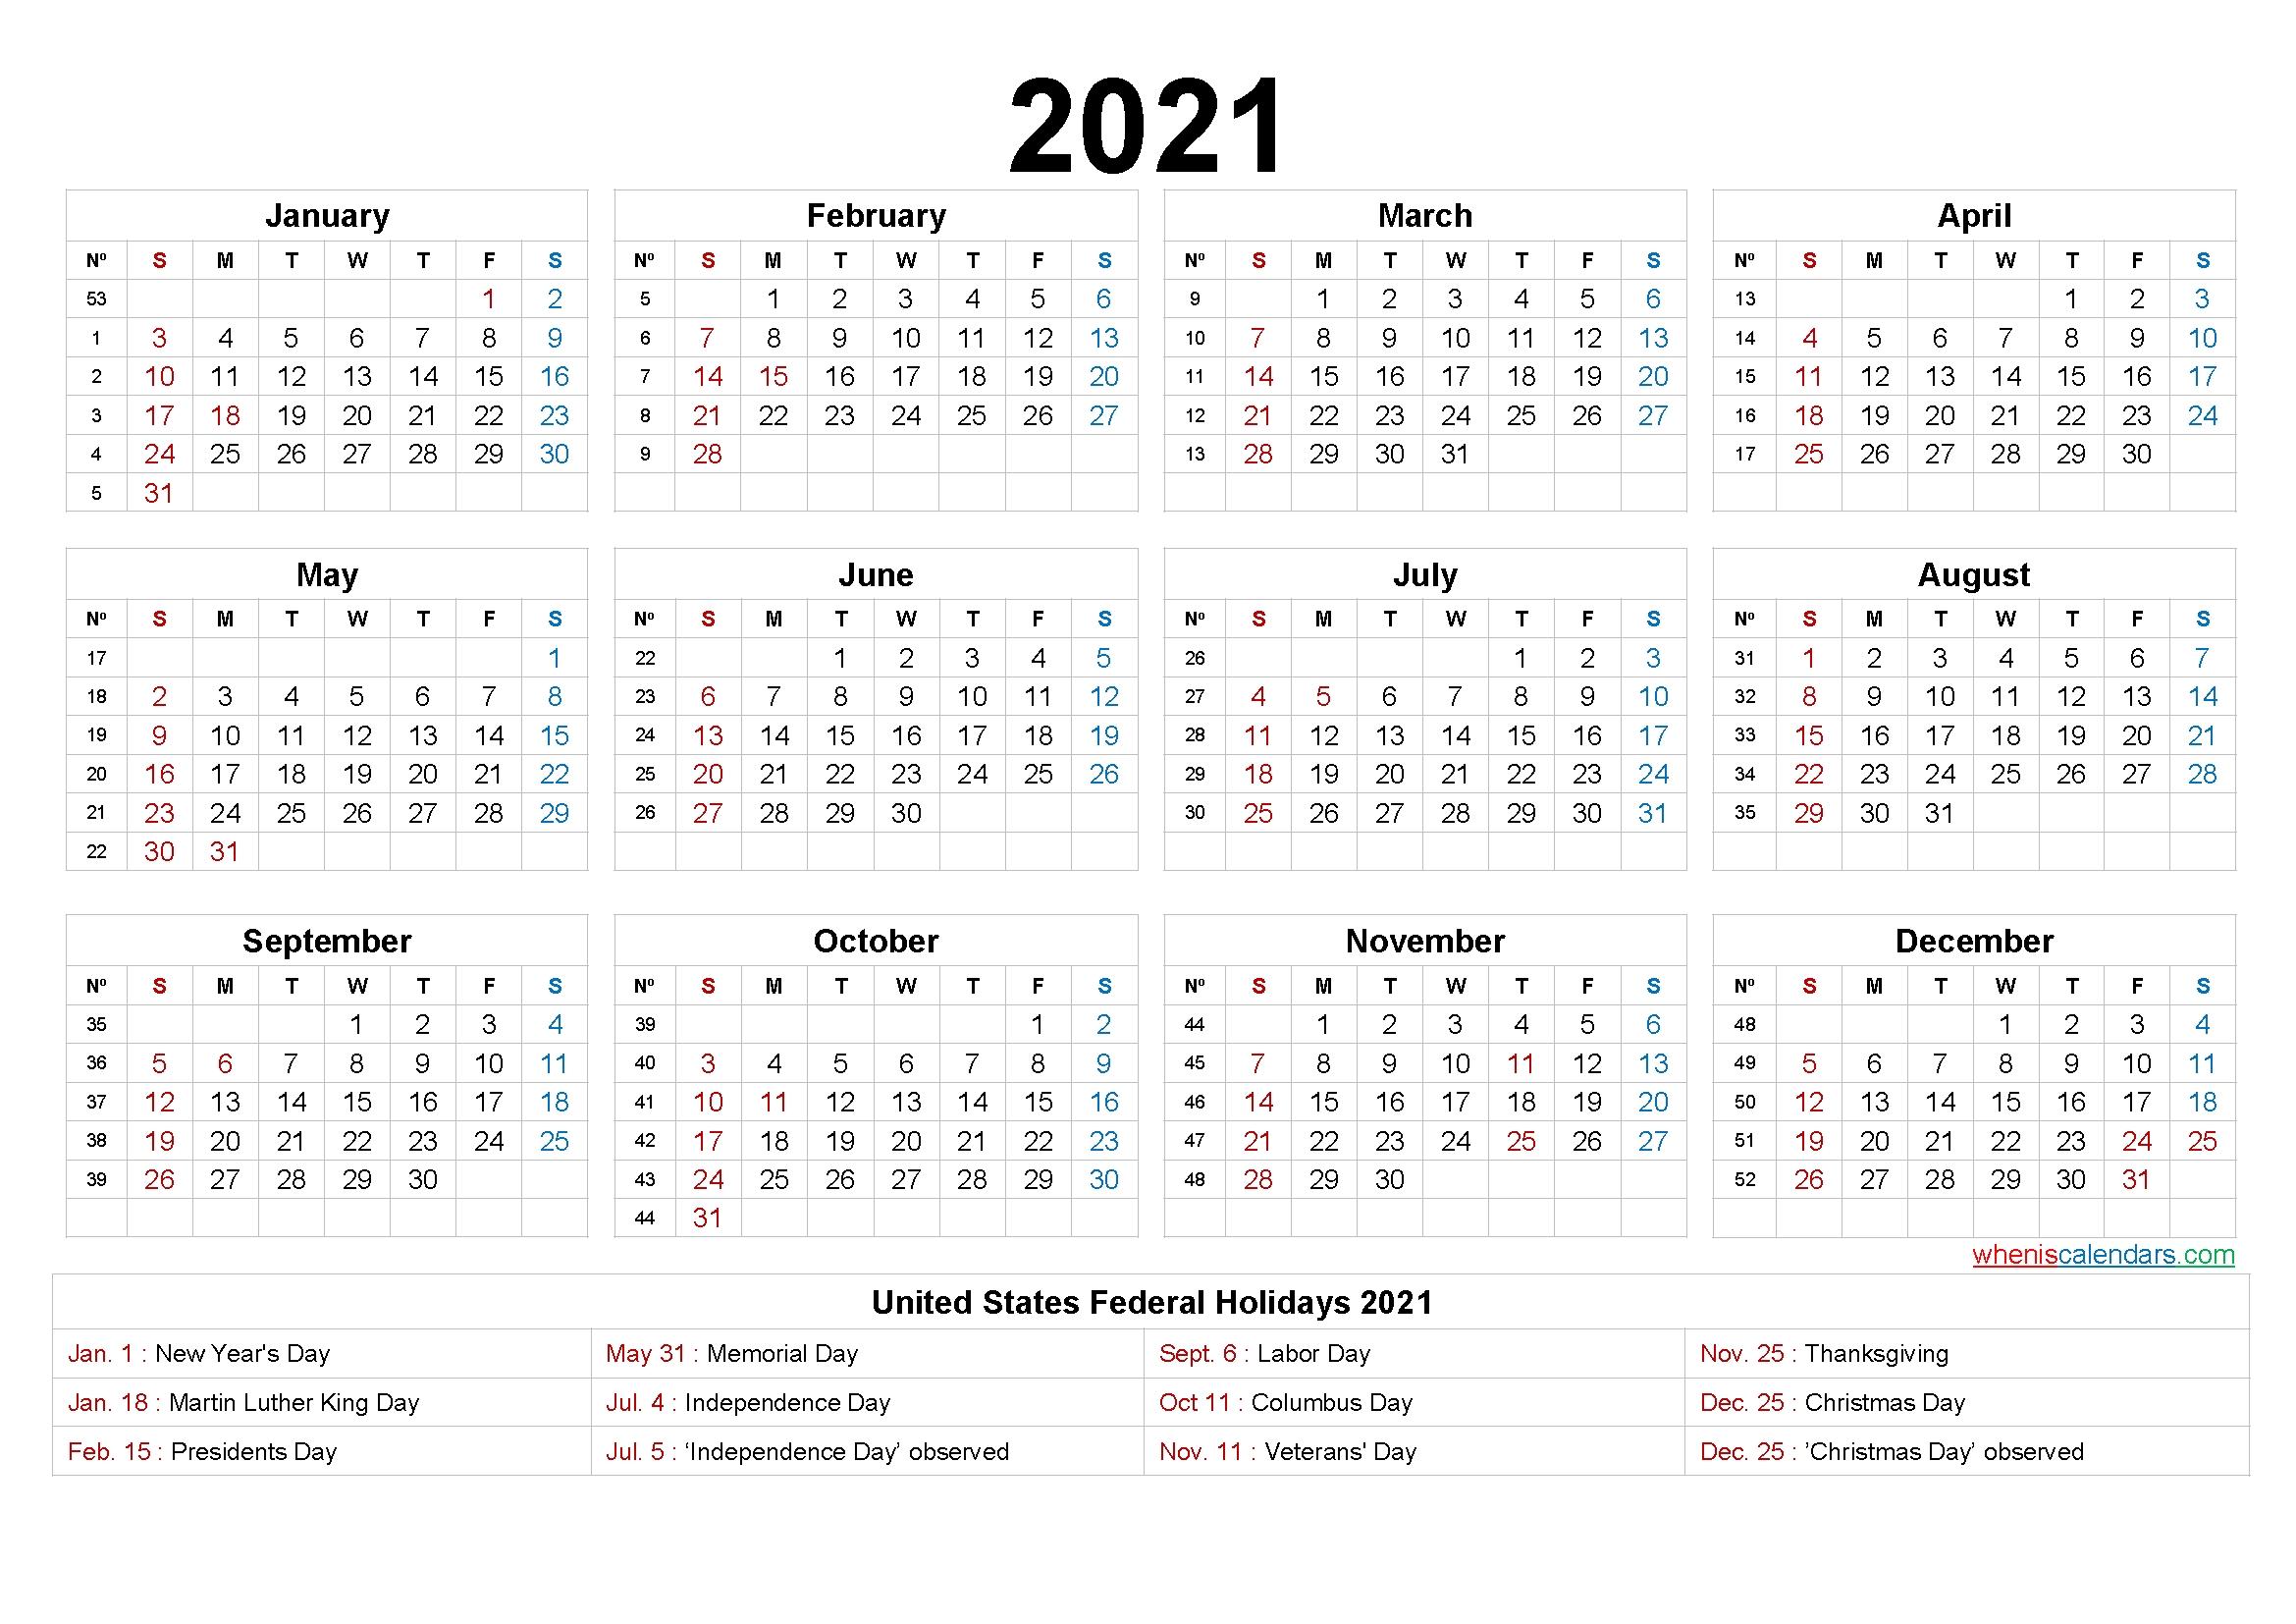 2021 One Page Calendar Printable - 6 Templates   Free Printable 2020 Calendar With Holidays for One Page Photo Calendar 2021 Image